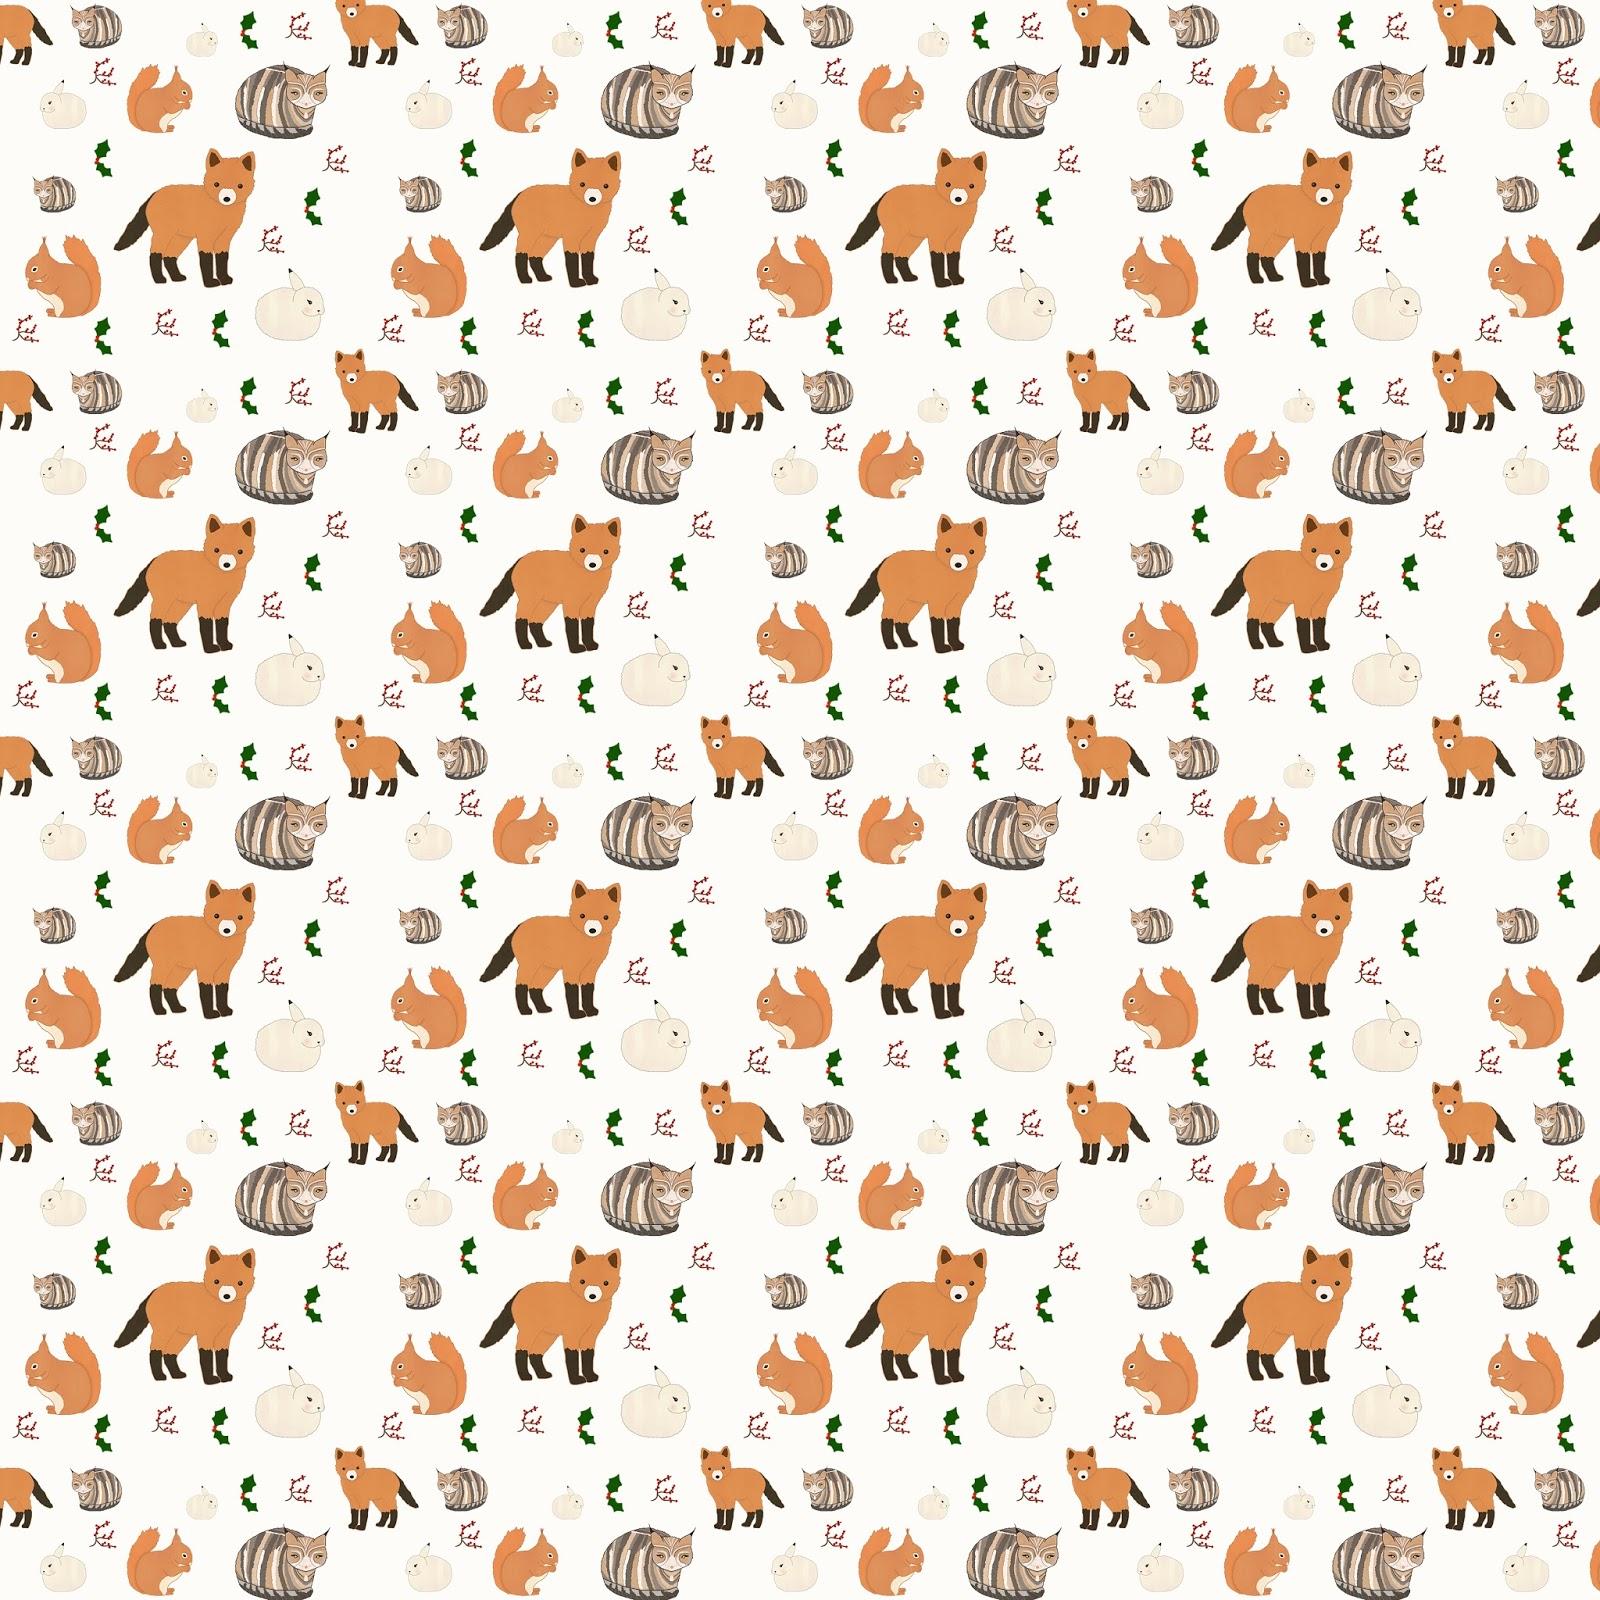 Carly watts art illustration winter animals pattern monday 9 december 2013 voltagebd Choice Image